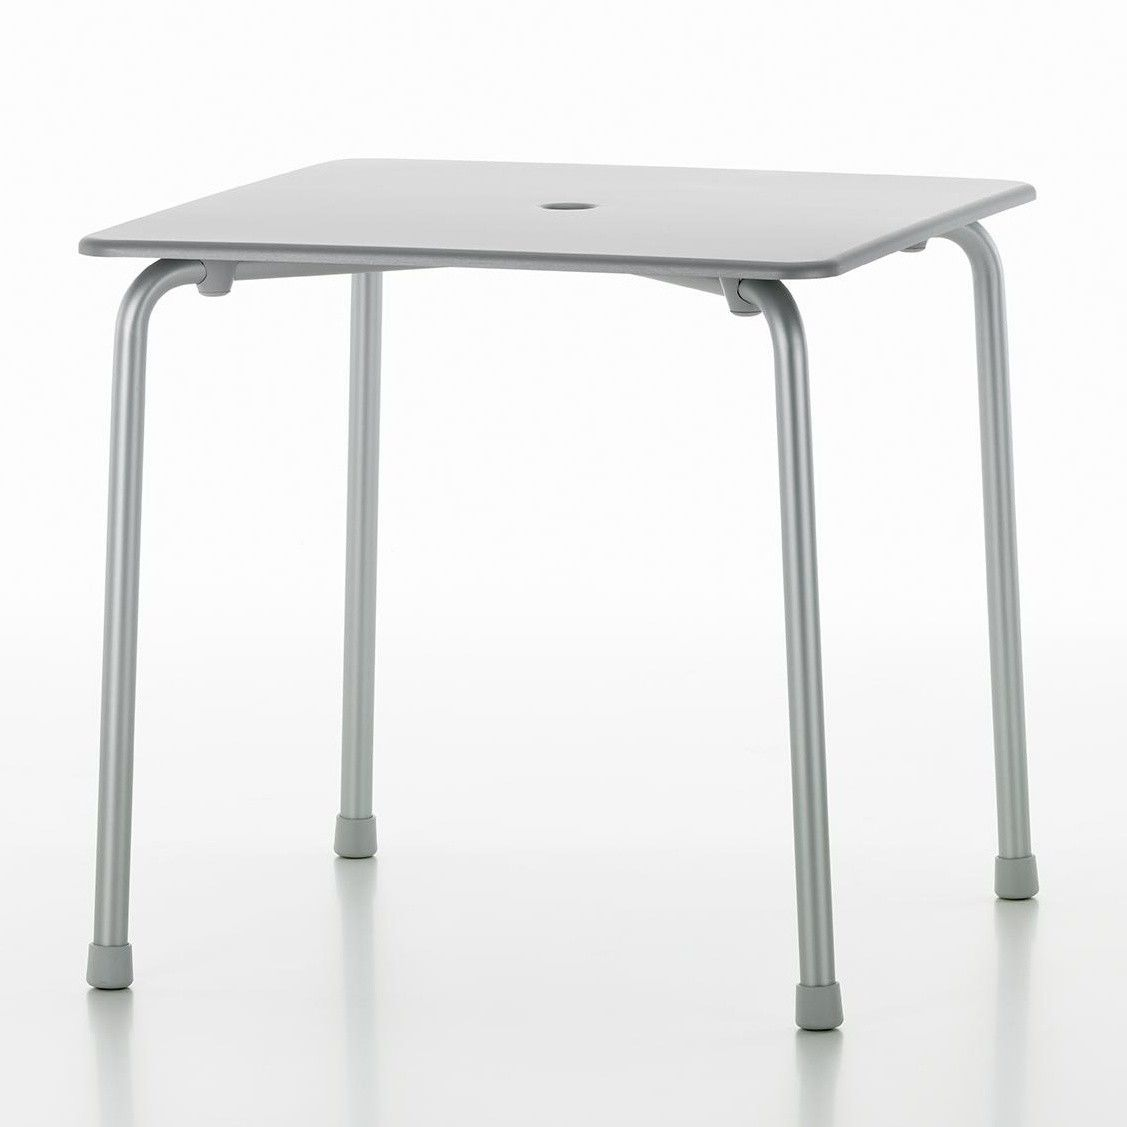 Davy Table Outdoor Tisch Vitra